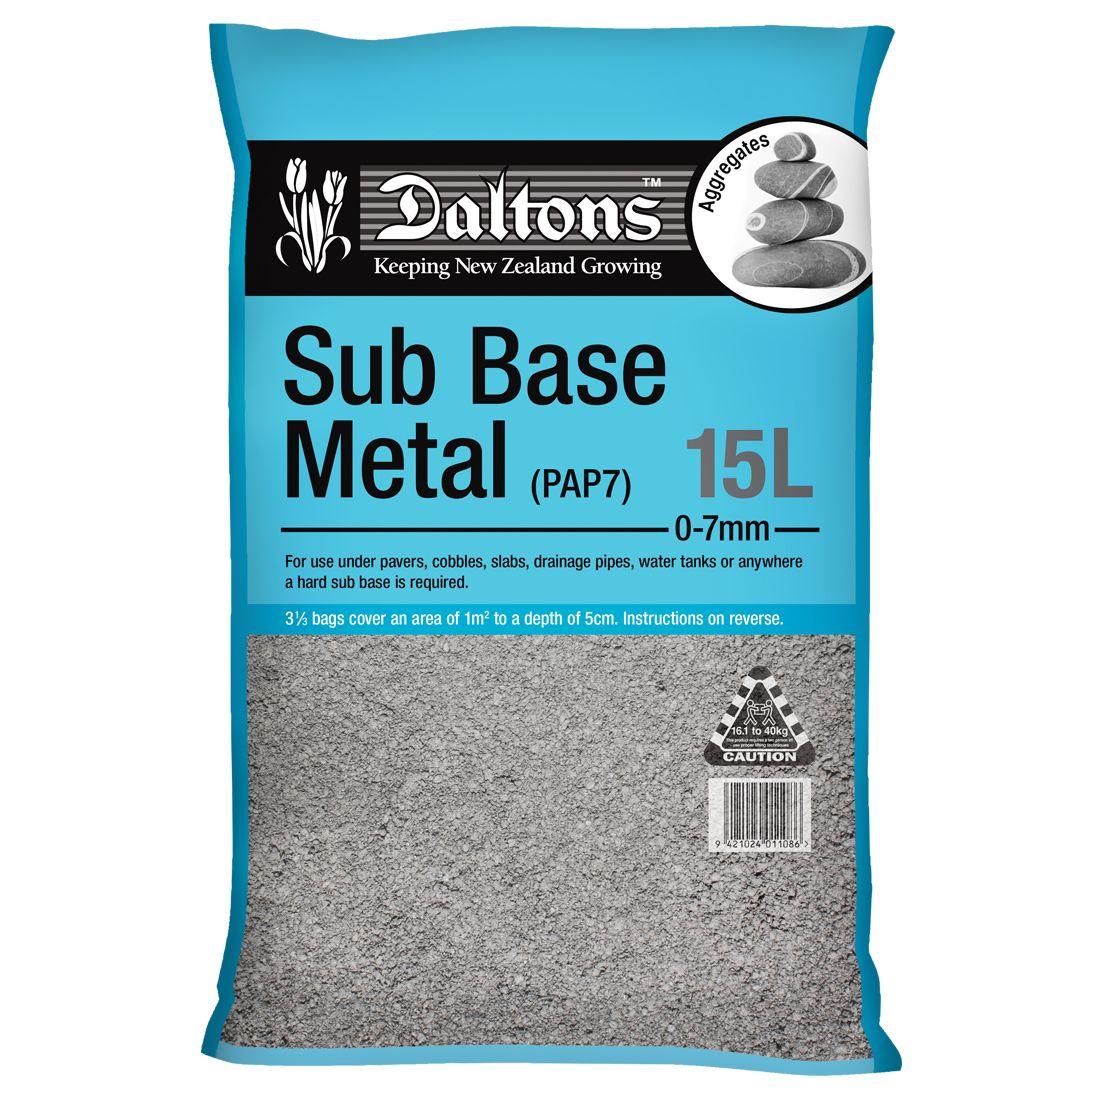 Sub Base Metal 15L Bag